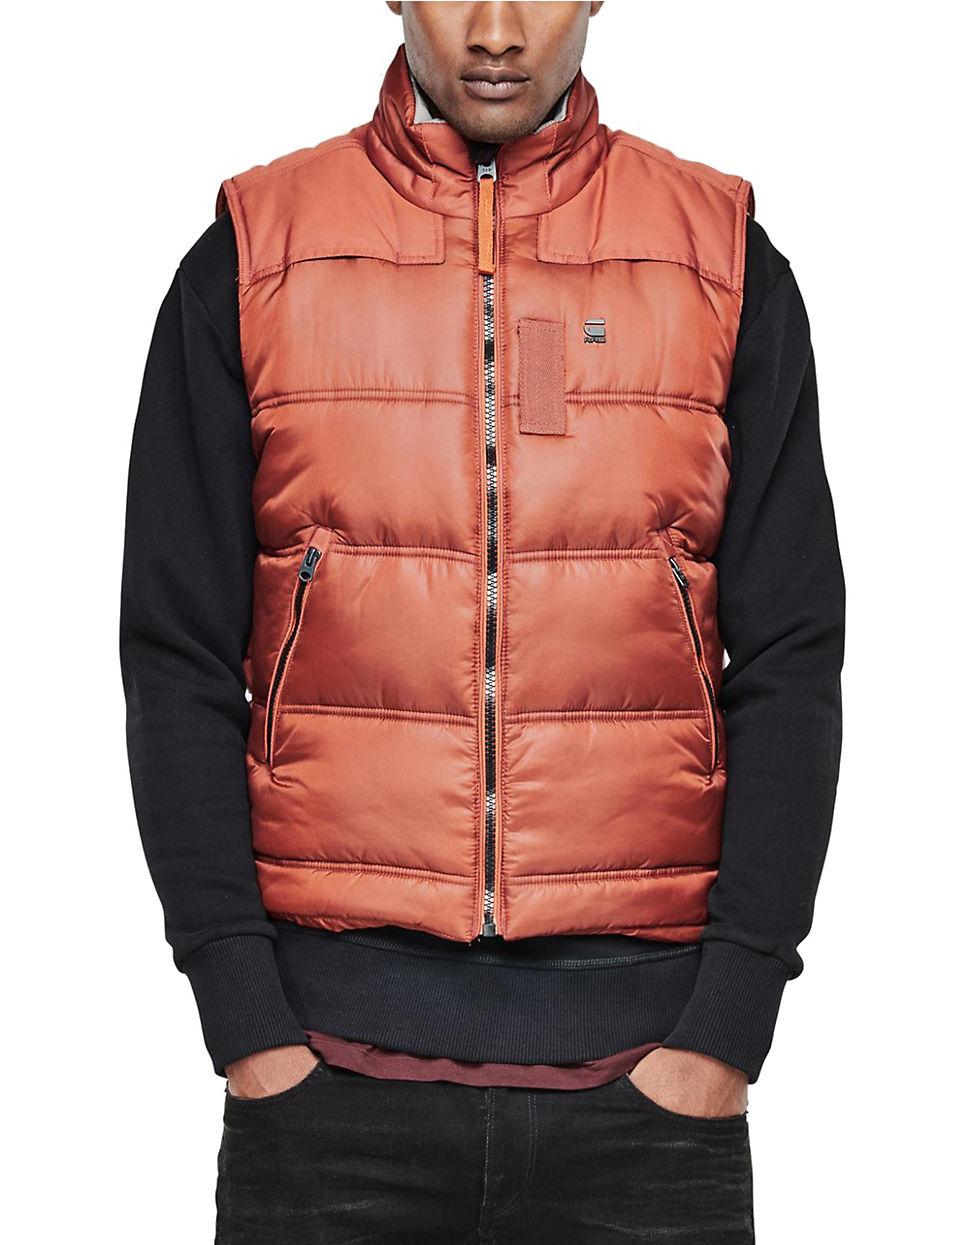 g star raw whistler quilted waterproof vest in pink for men lyst. Black Bedroom Furniture Sets. Home Design Ideas